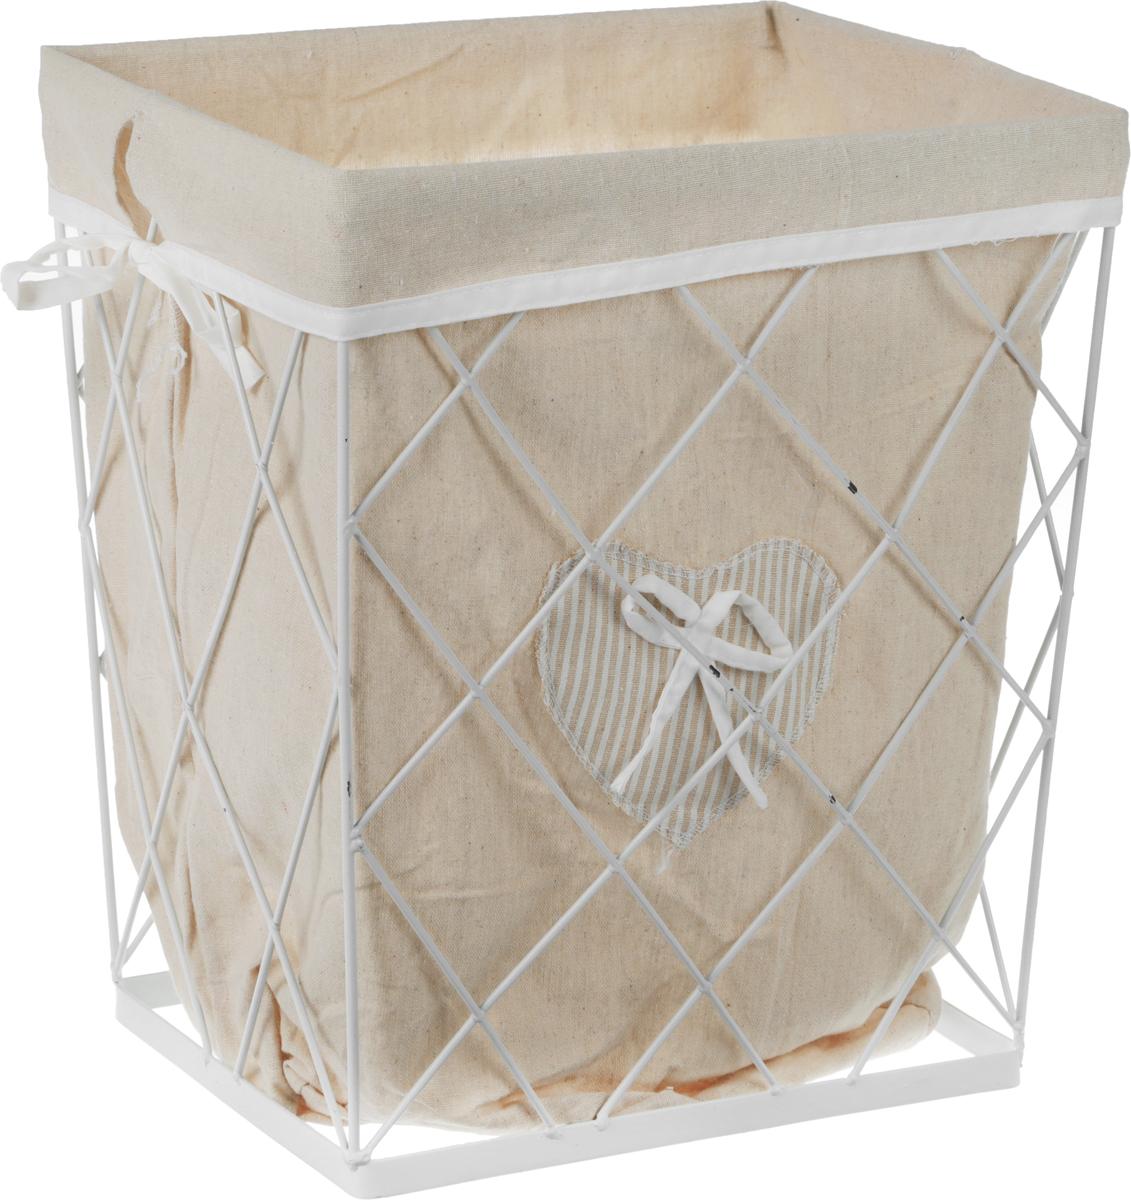 Корзина для белья Handy Home Решетка, цвет: белый, 35 х 24 х 40 см корзина для белья natural house лаванда высокая цвет белый 48 х 36 х 55 см